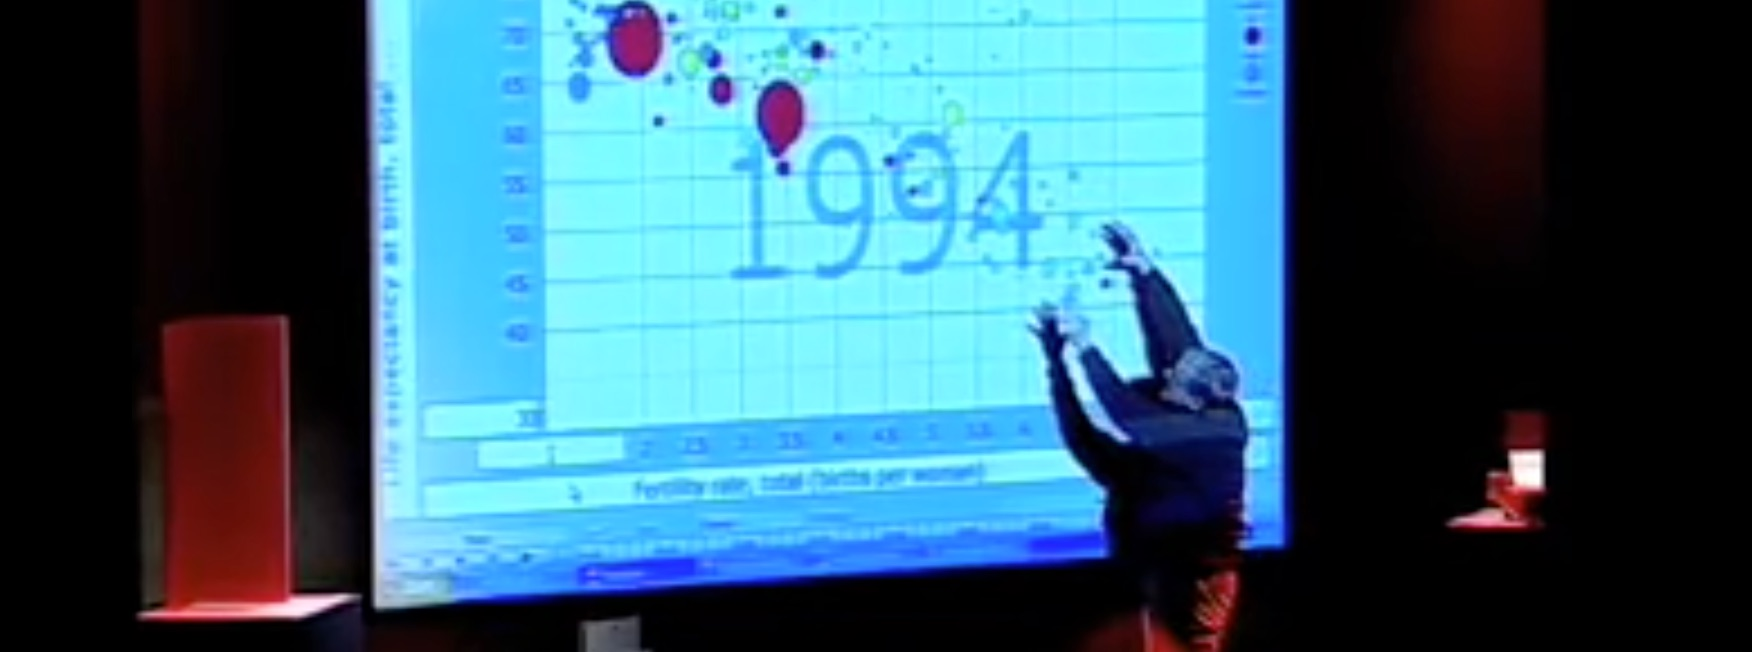 Hans Roslings fantastiska statistik